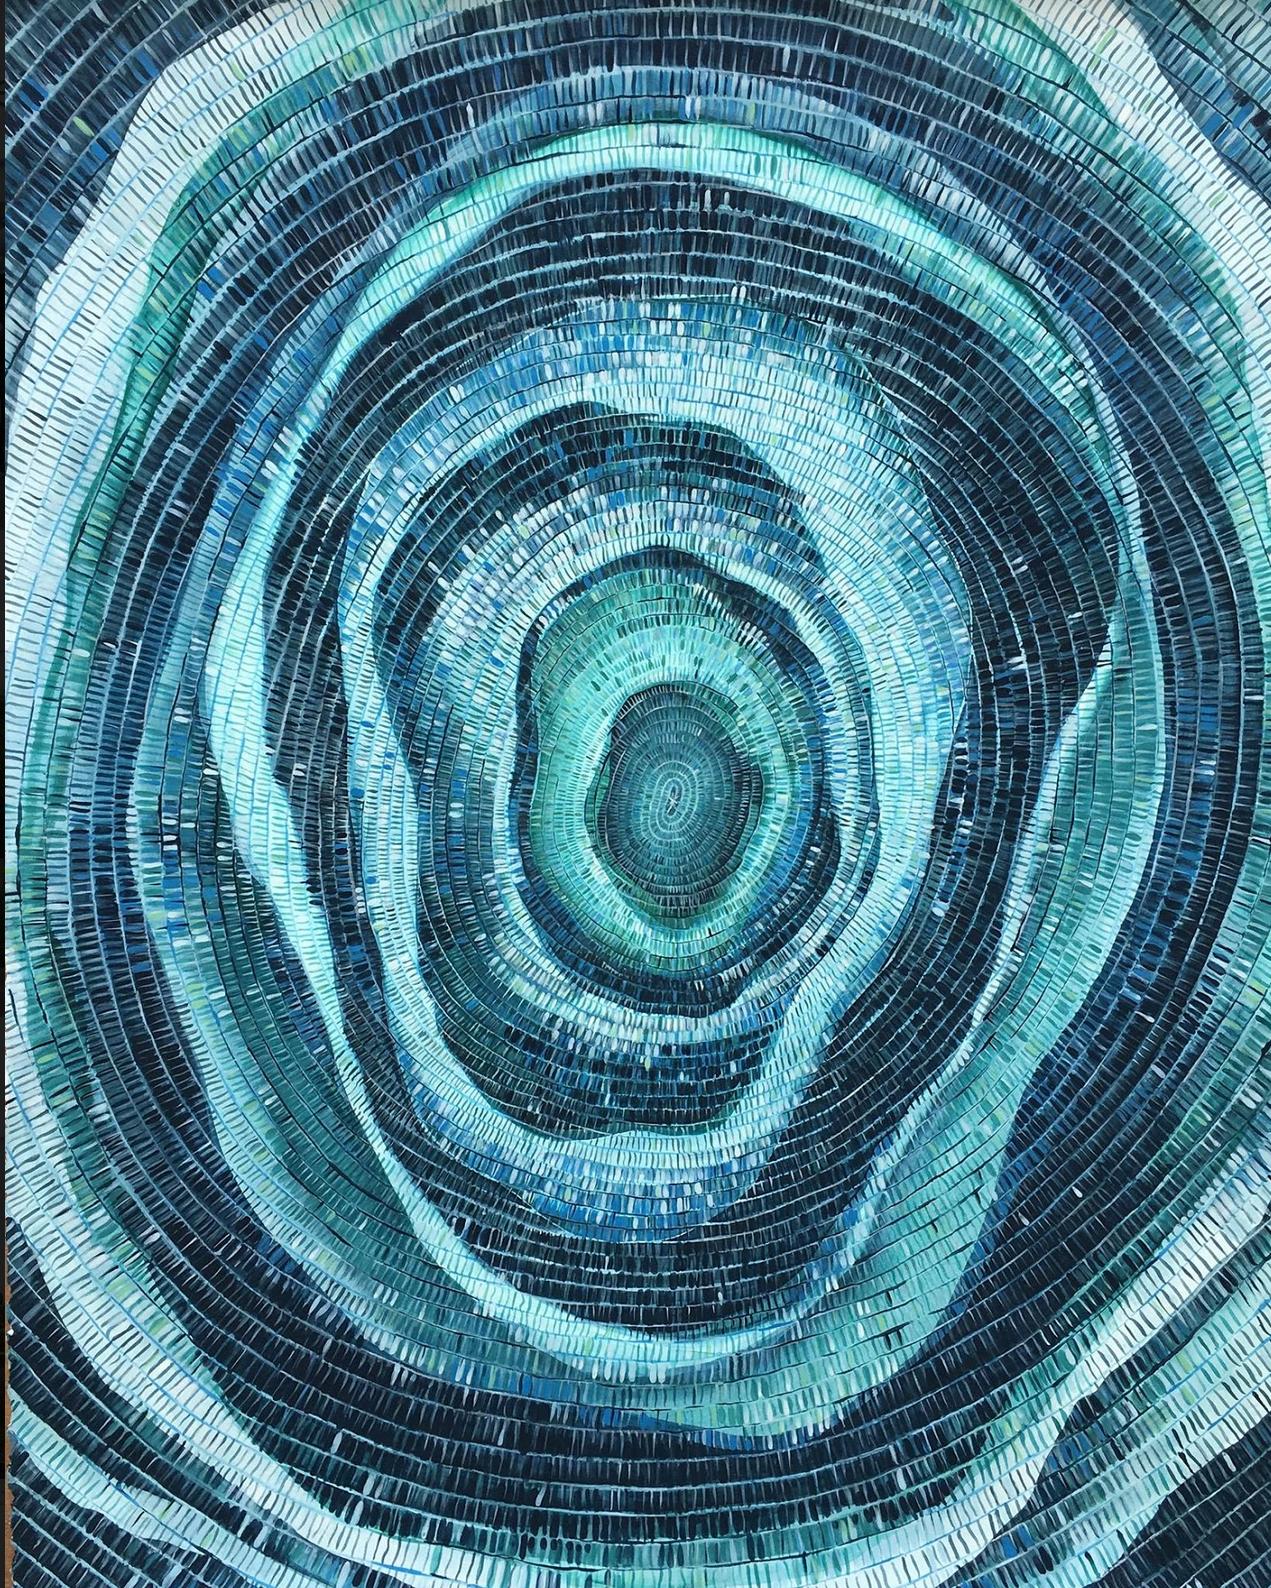 Nature's fingerprints gracing gallery walls